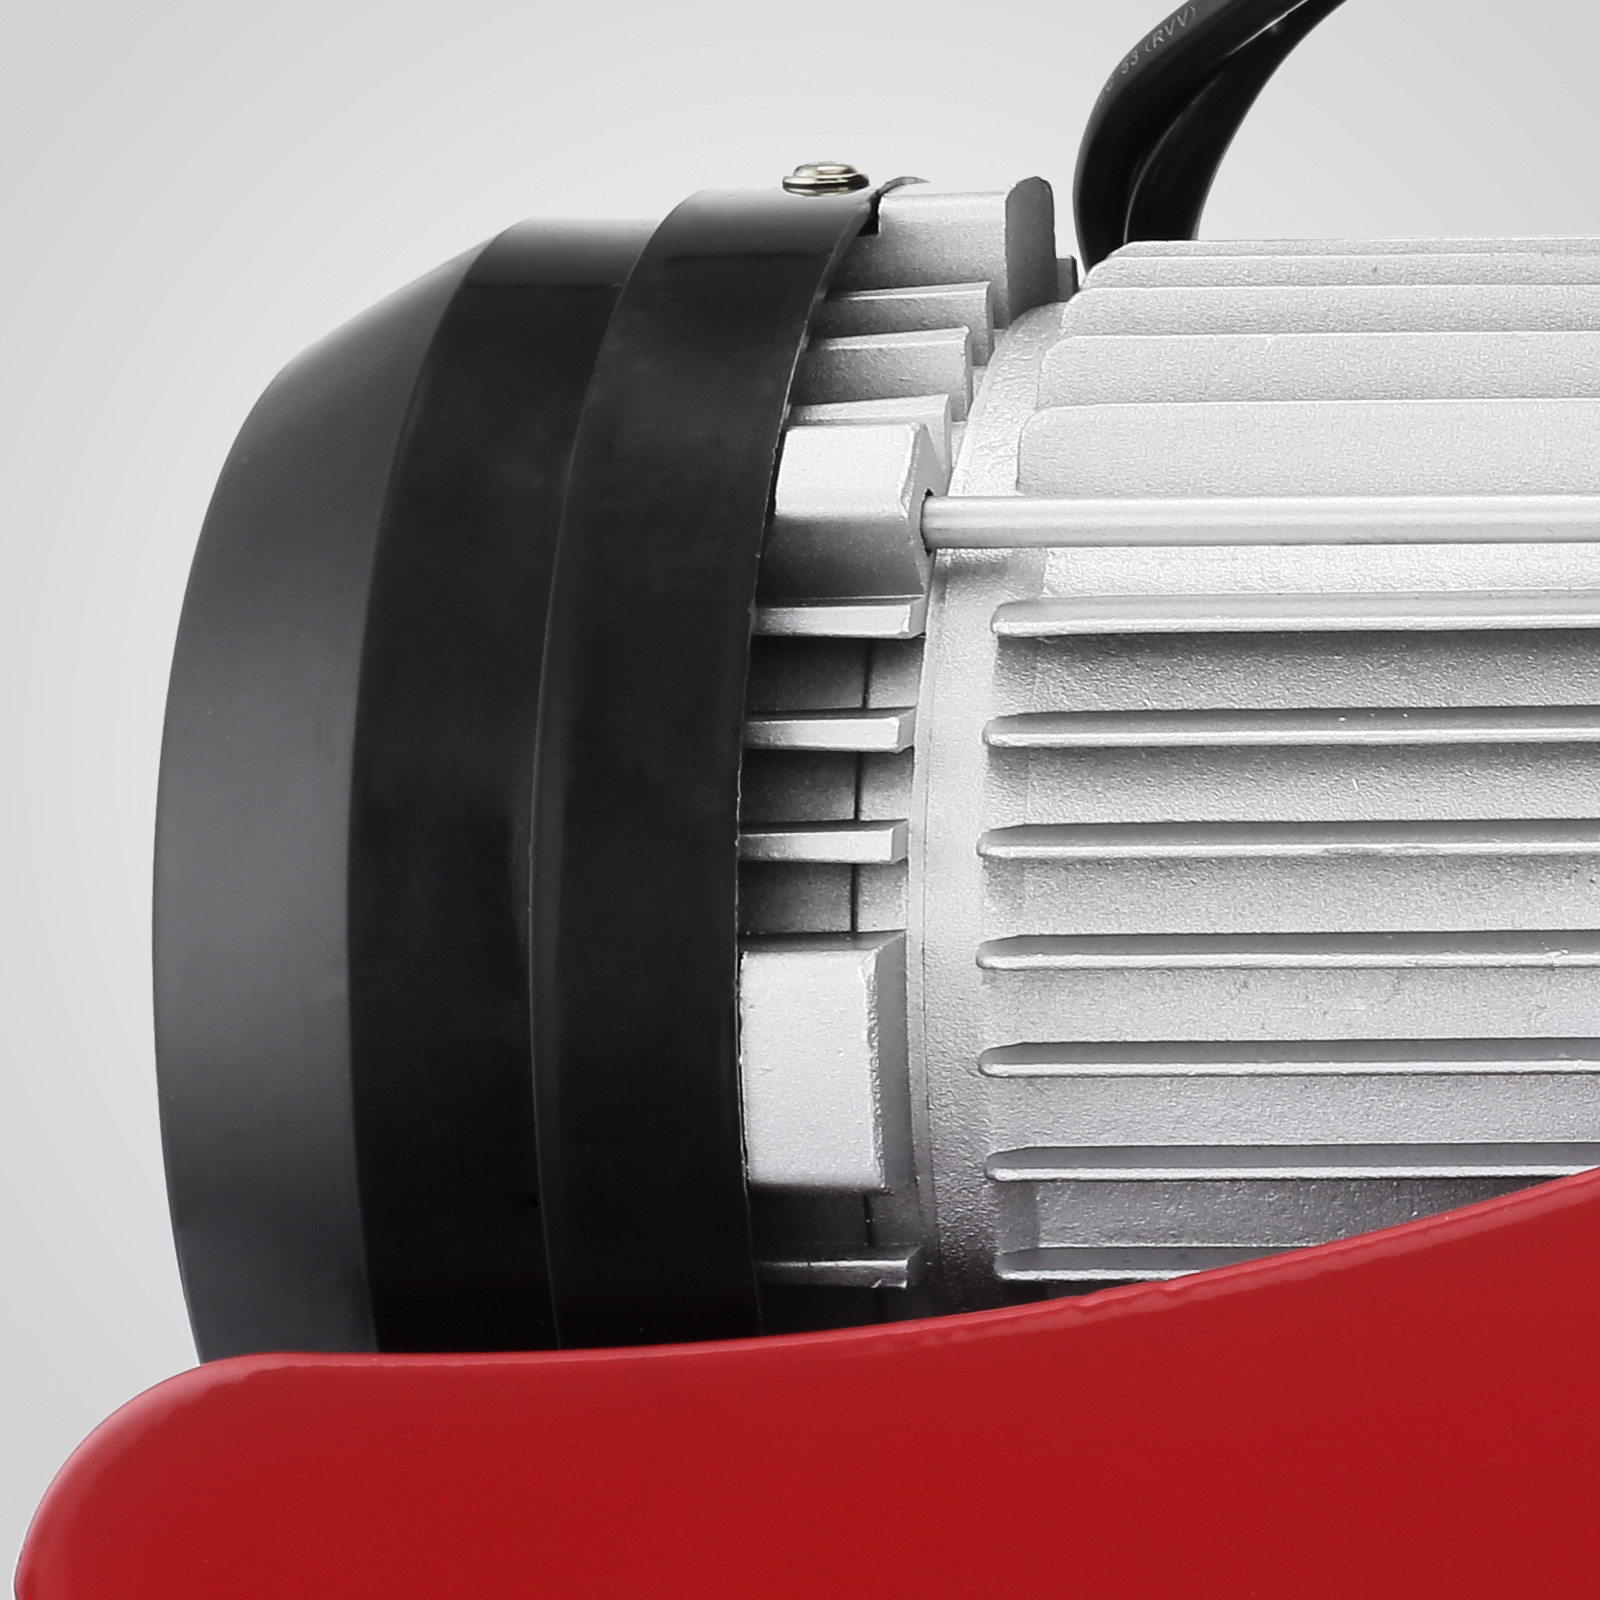 100kg-900kg-Electric-Hoist-Winch-Lifting-Engine-Crane-Cable-Lift-Hook-Garage miniature 67